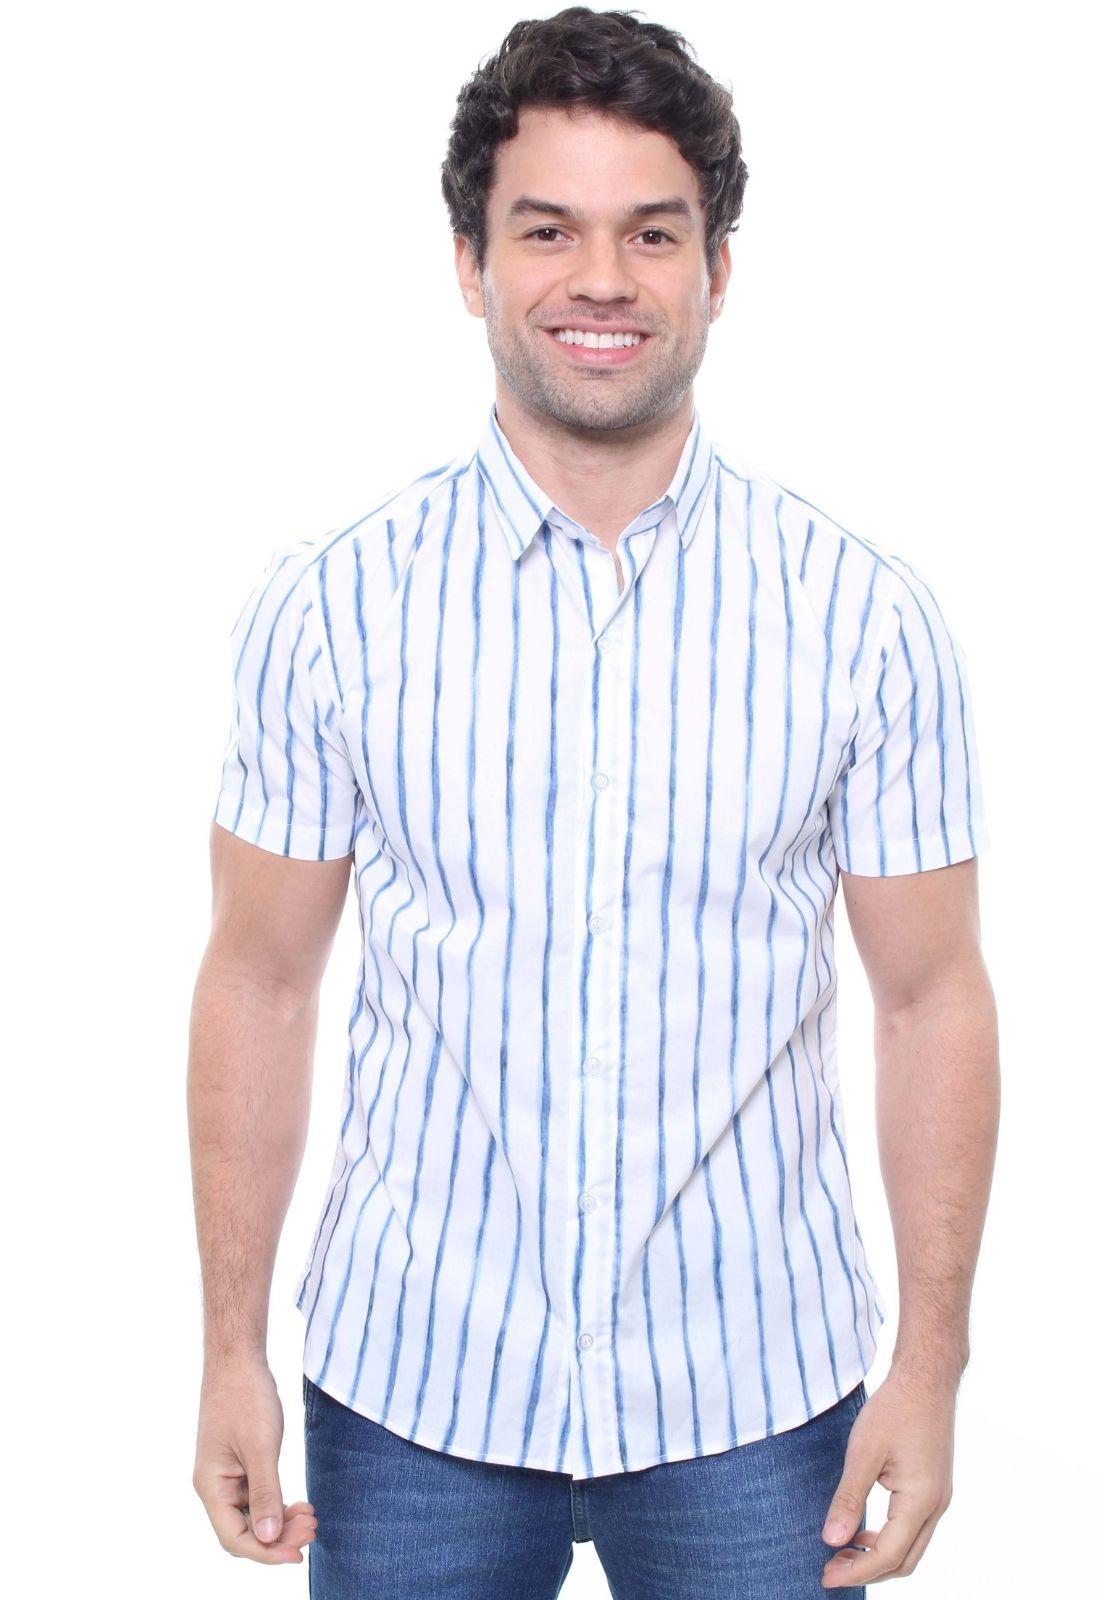 Camisa Estampada Masculina Manga Curta Crocker - 47828  - CROCKER JEANS